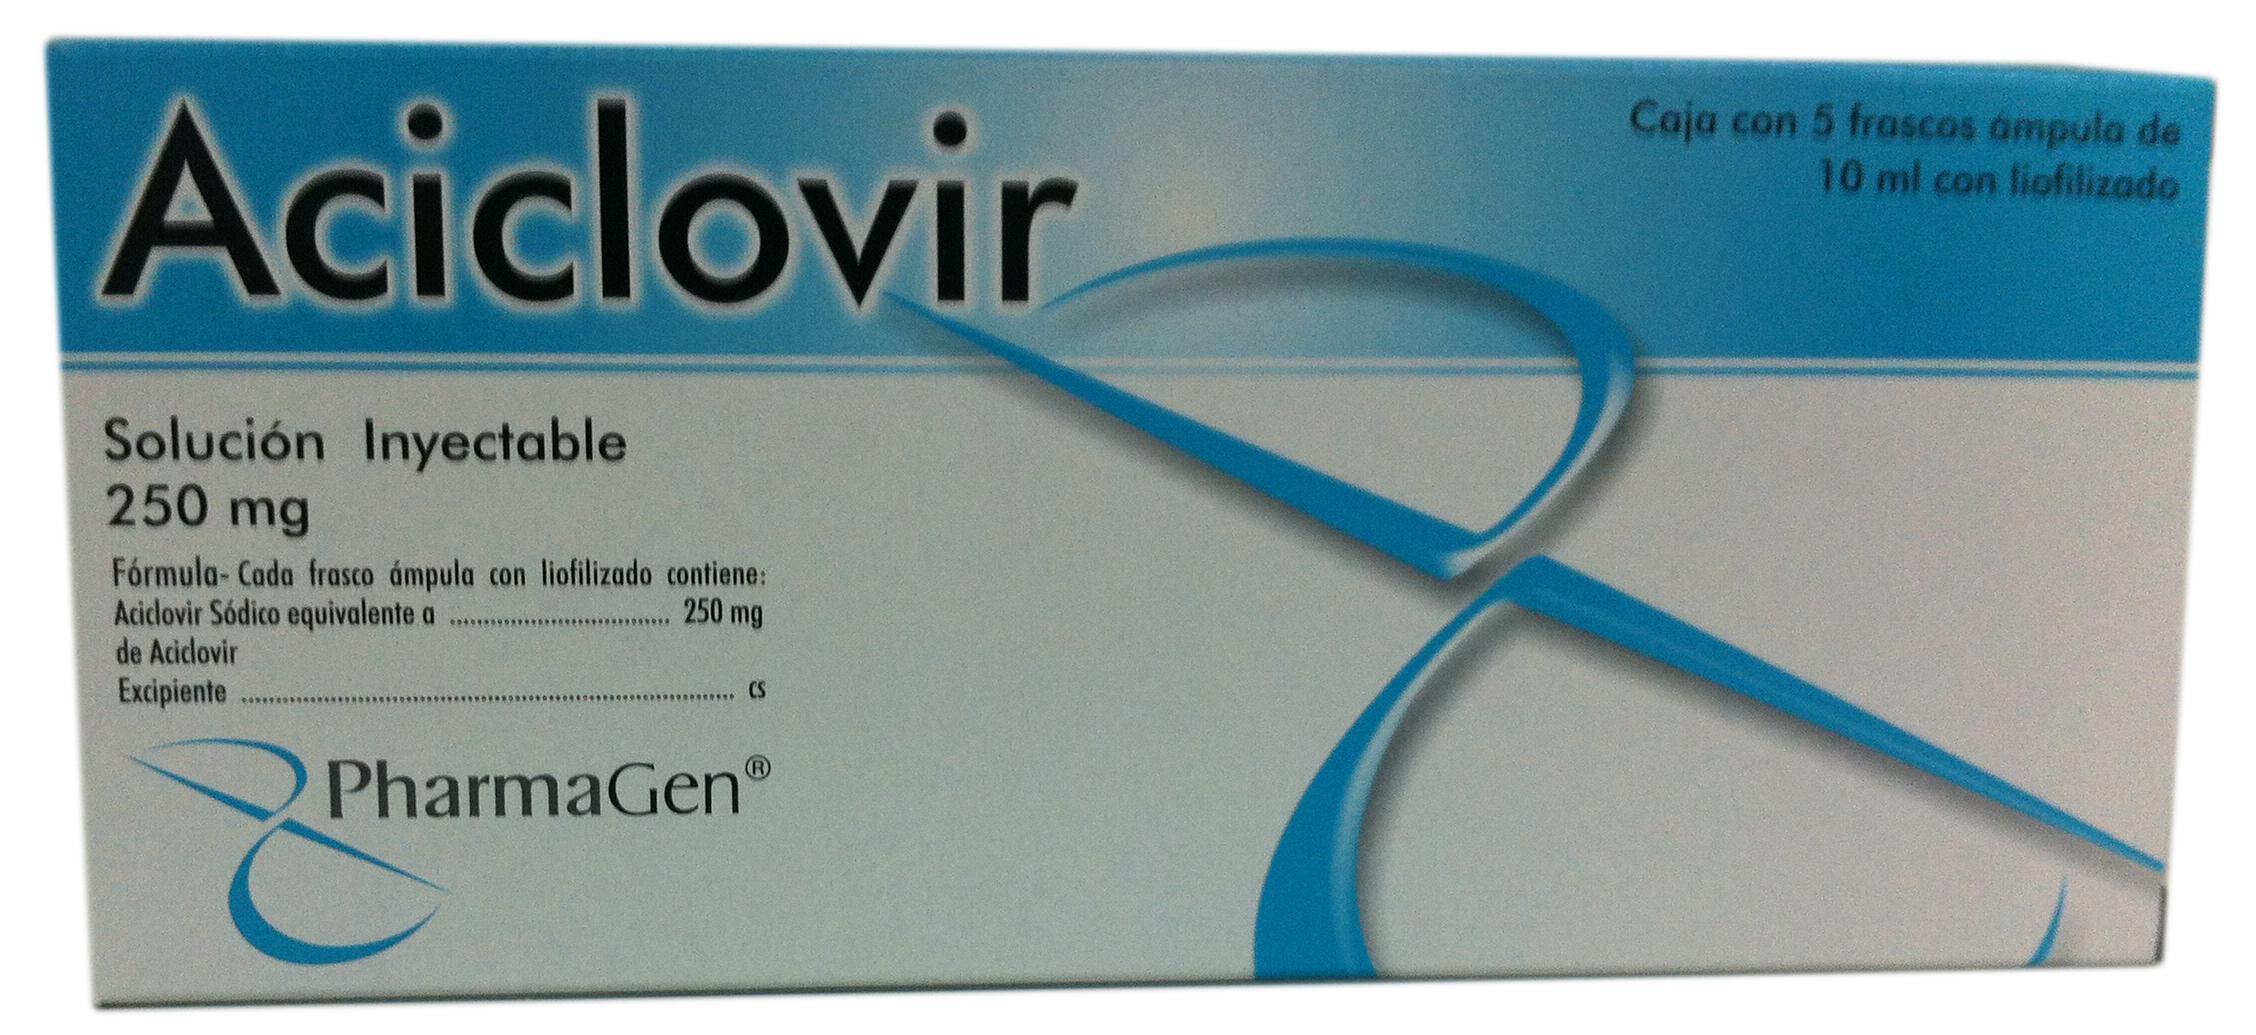 Aciclovir (Oral)